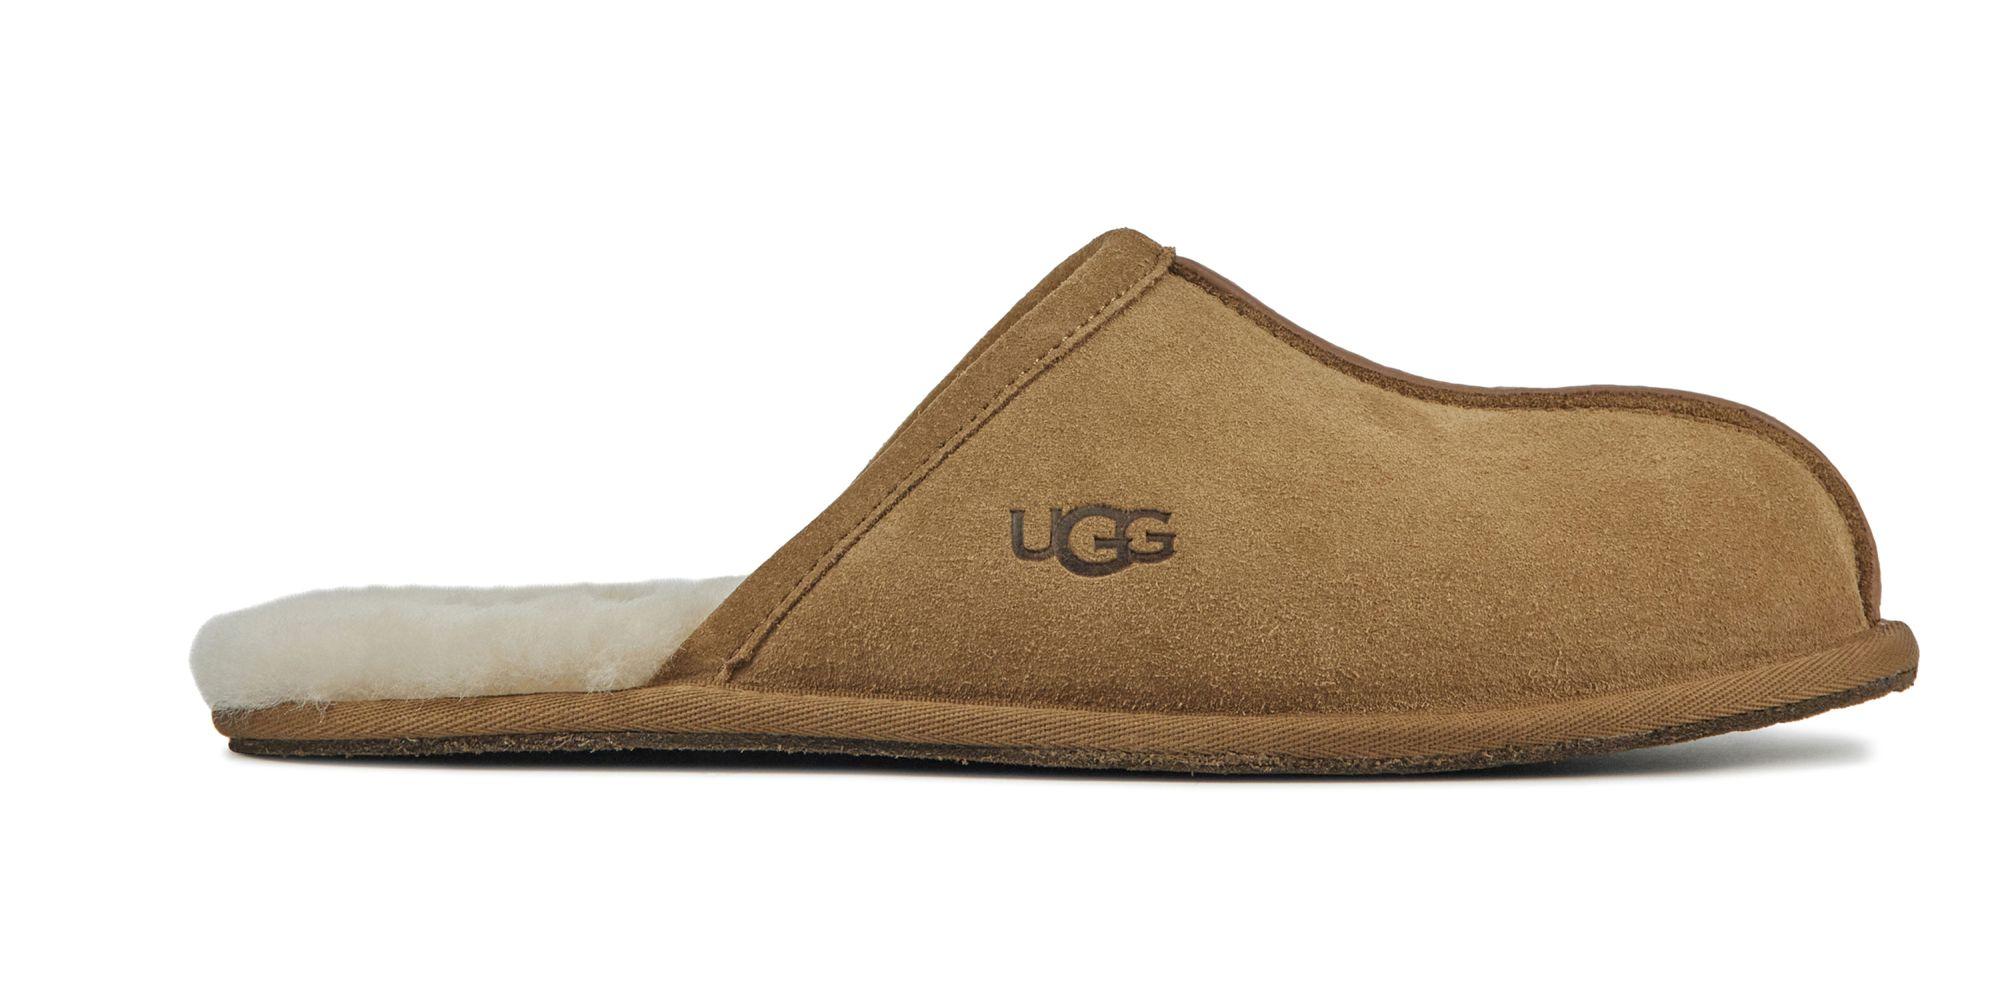 UGG Heren Leren PantoffelsPantoffels